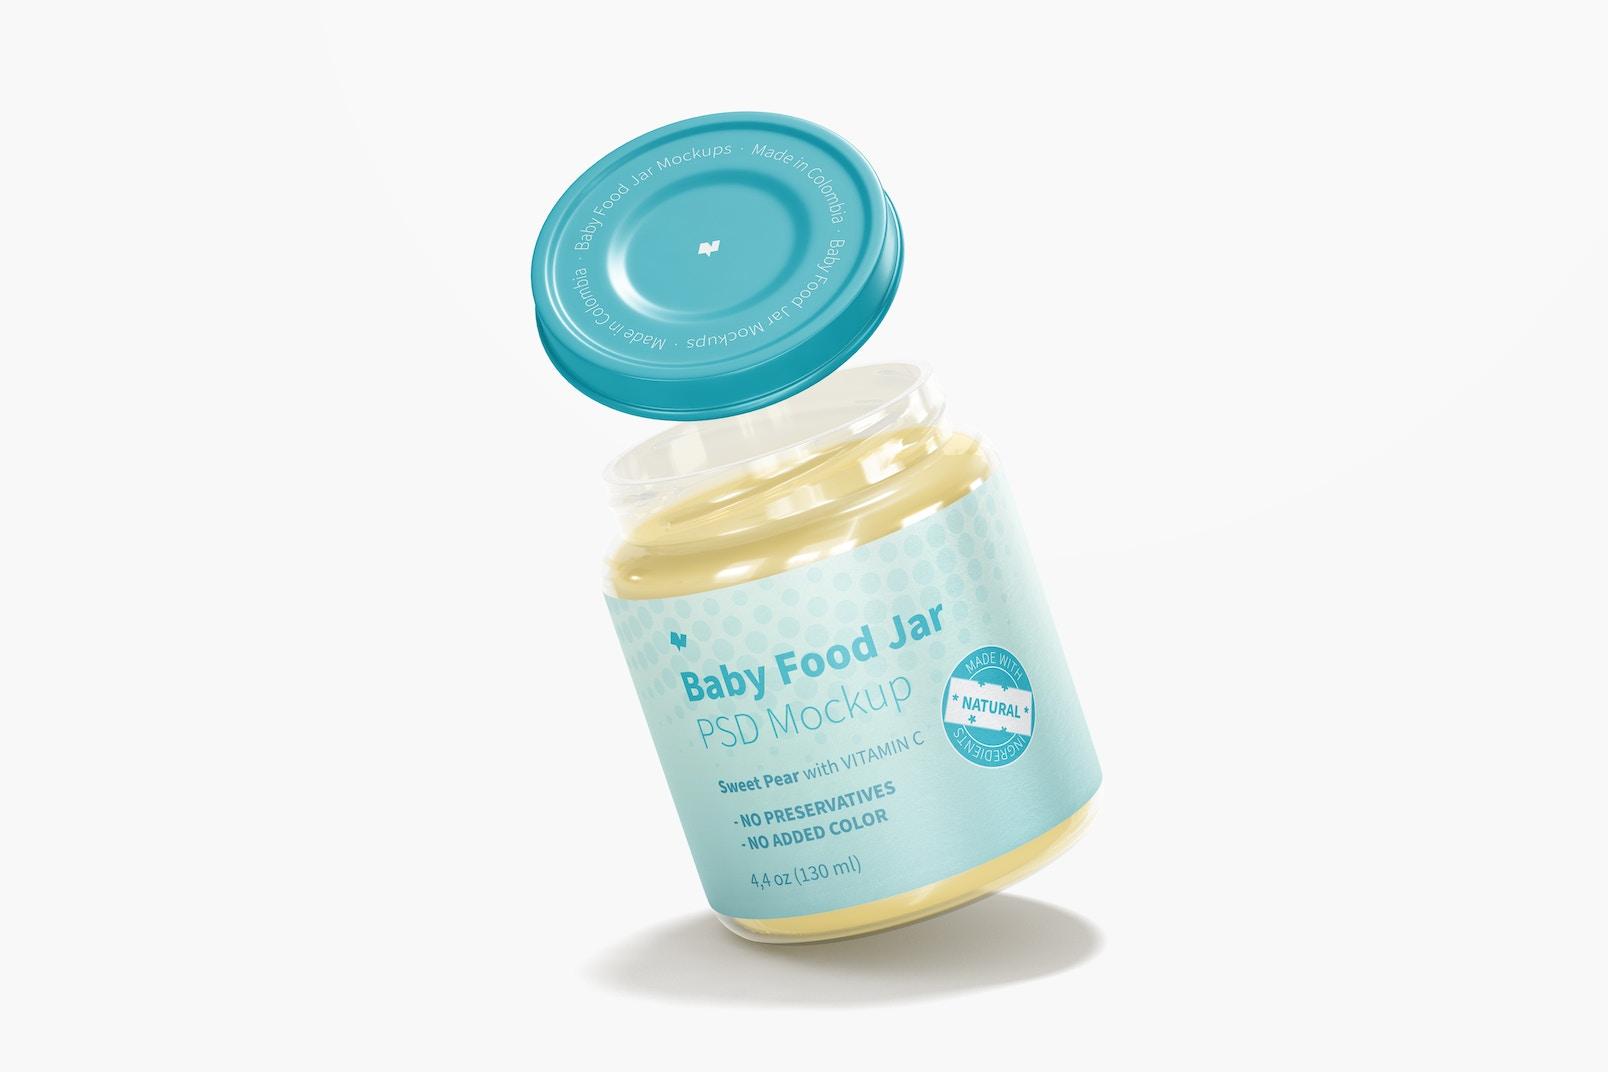 Baby Food Jar Mockup, Falling